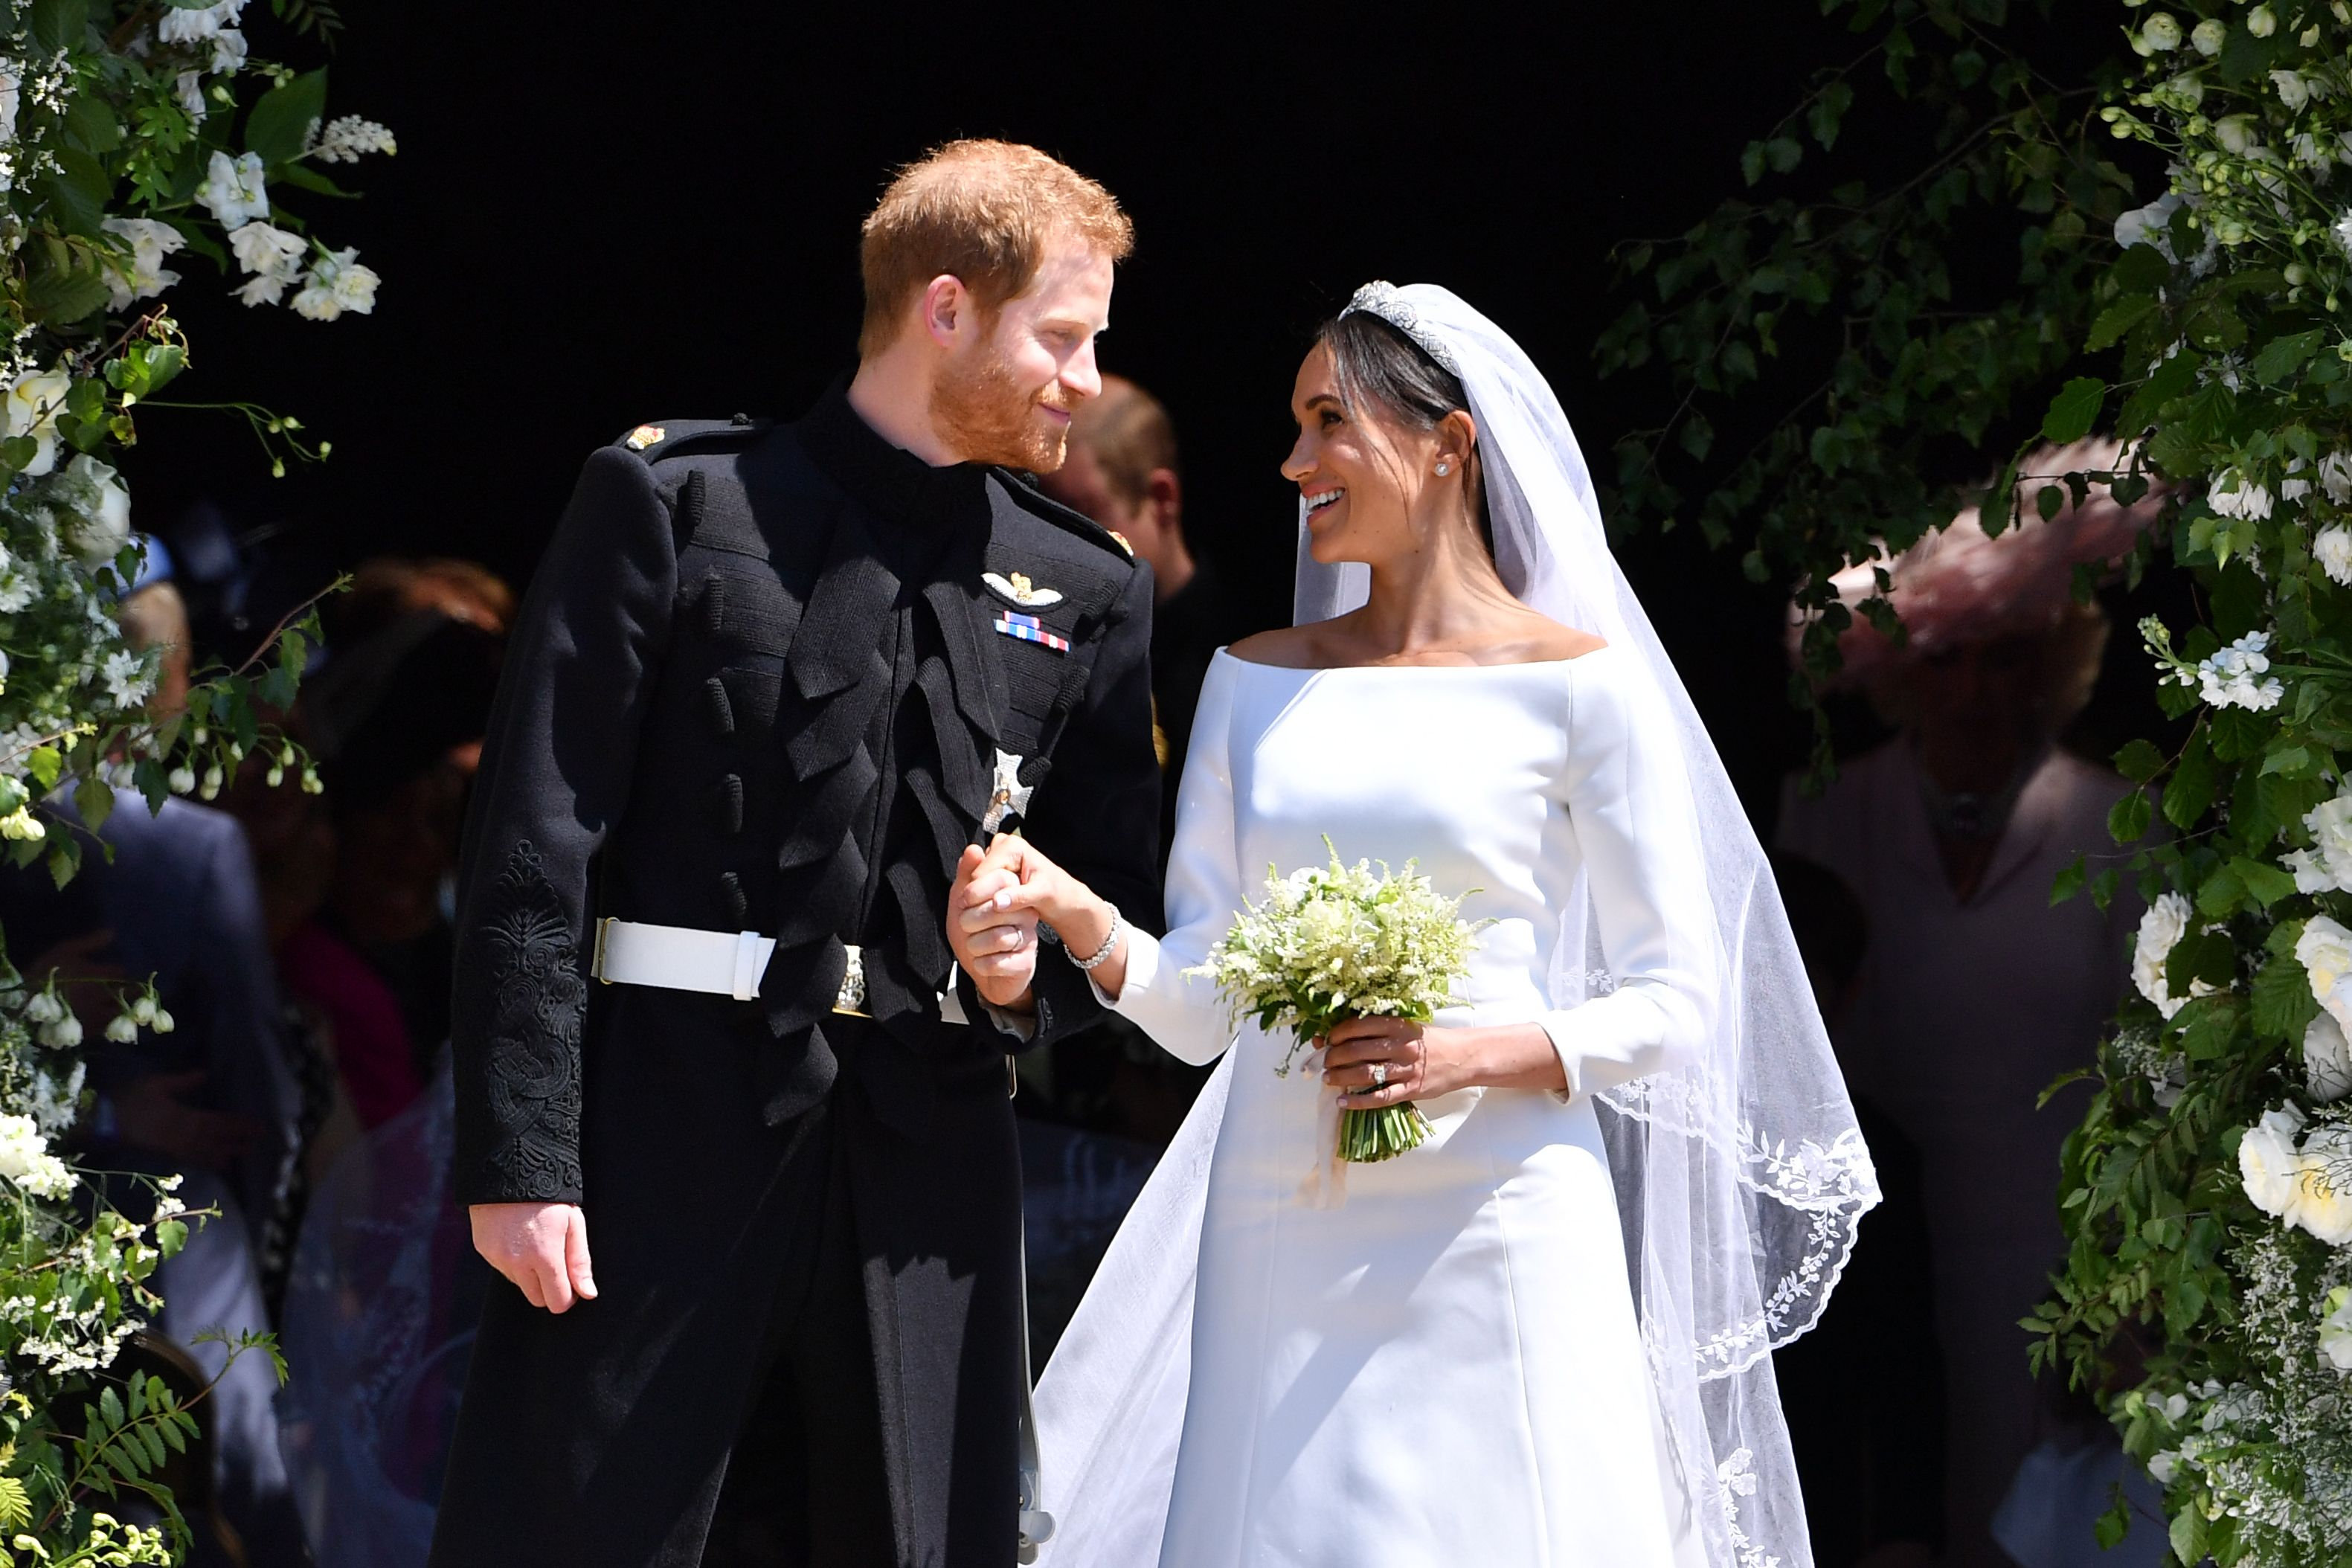 Meghan Markle and Prince Harry Were Secretly Married Pre-Royal Wedding